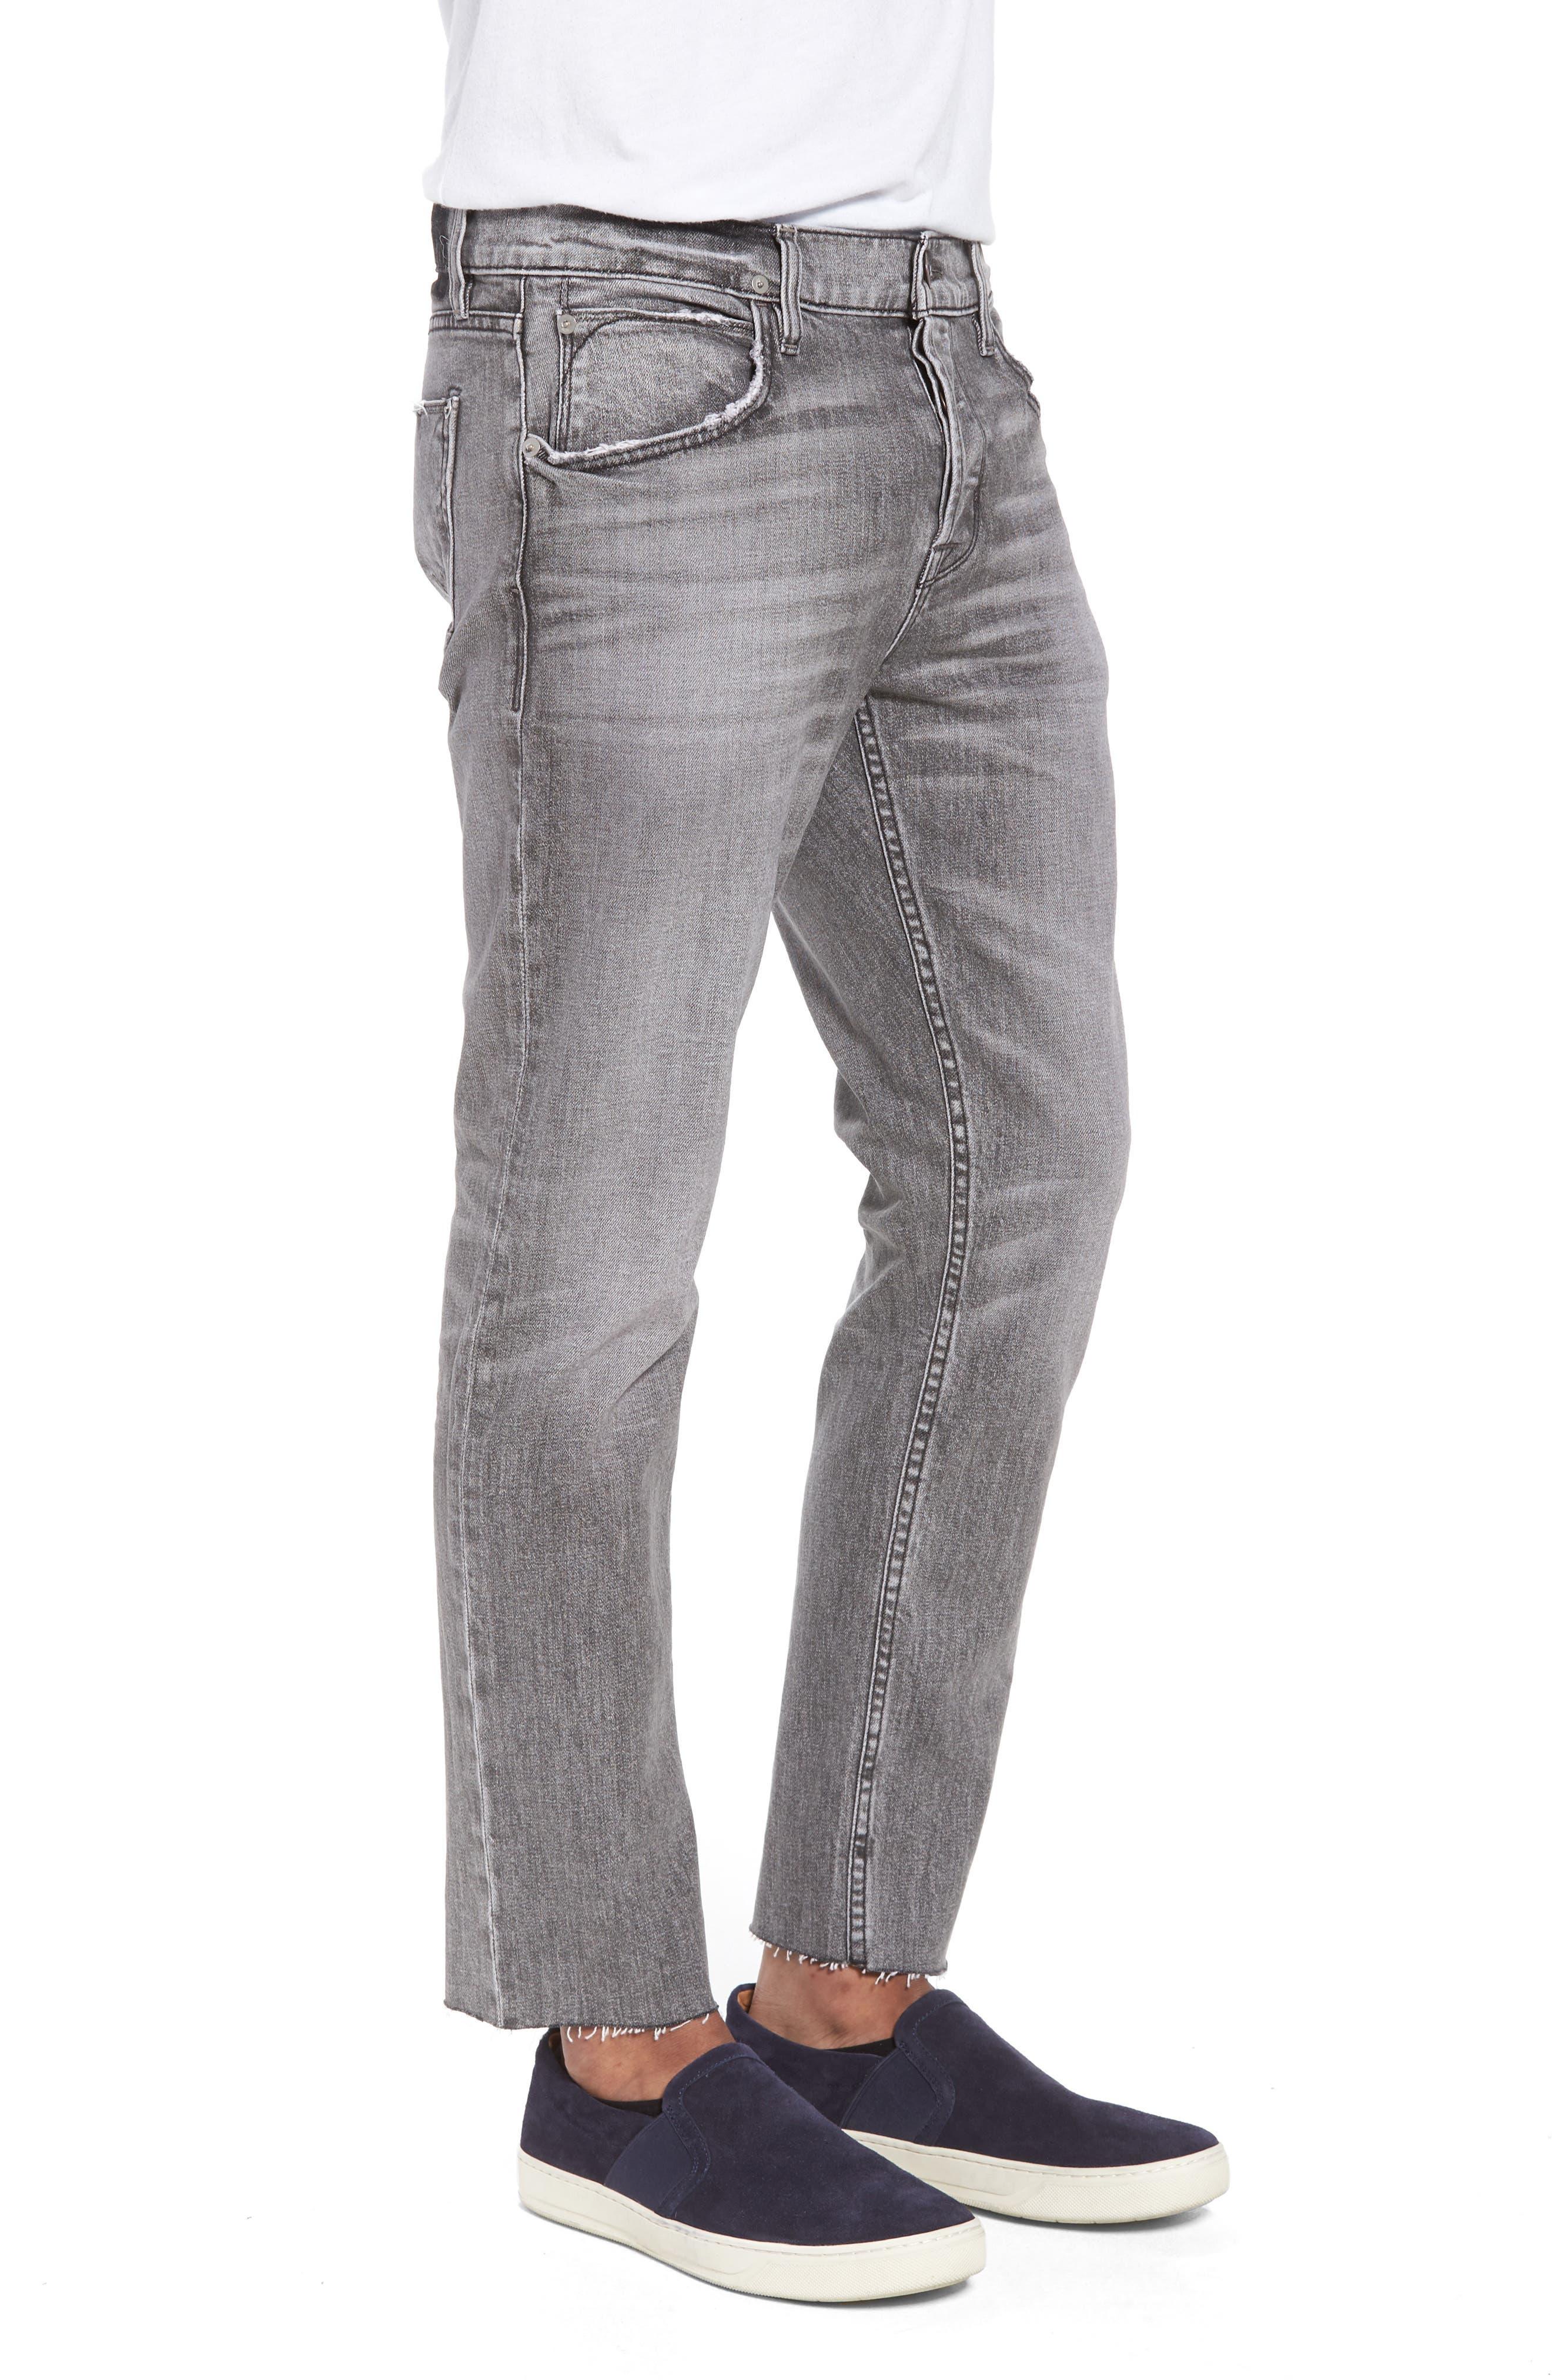 HUDSON JEANS,                             Blake Slim Fit Jeans,                             Alternate thumbnail 3, color,                             063